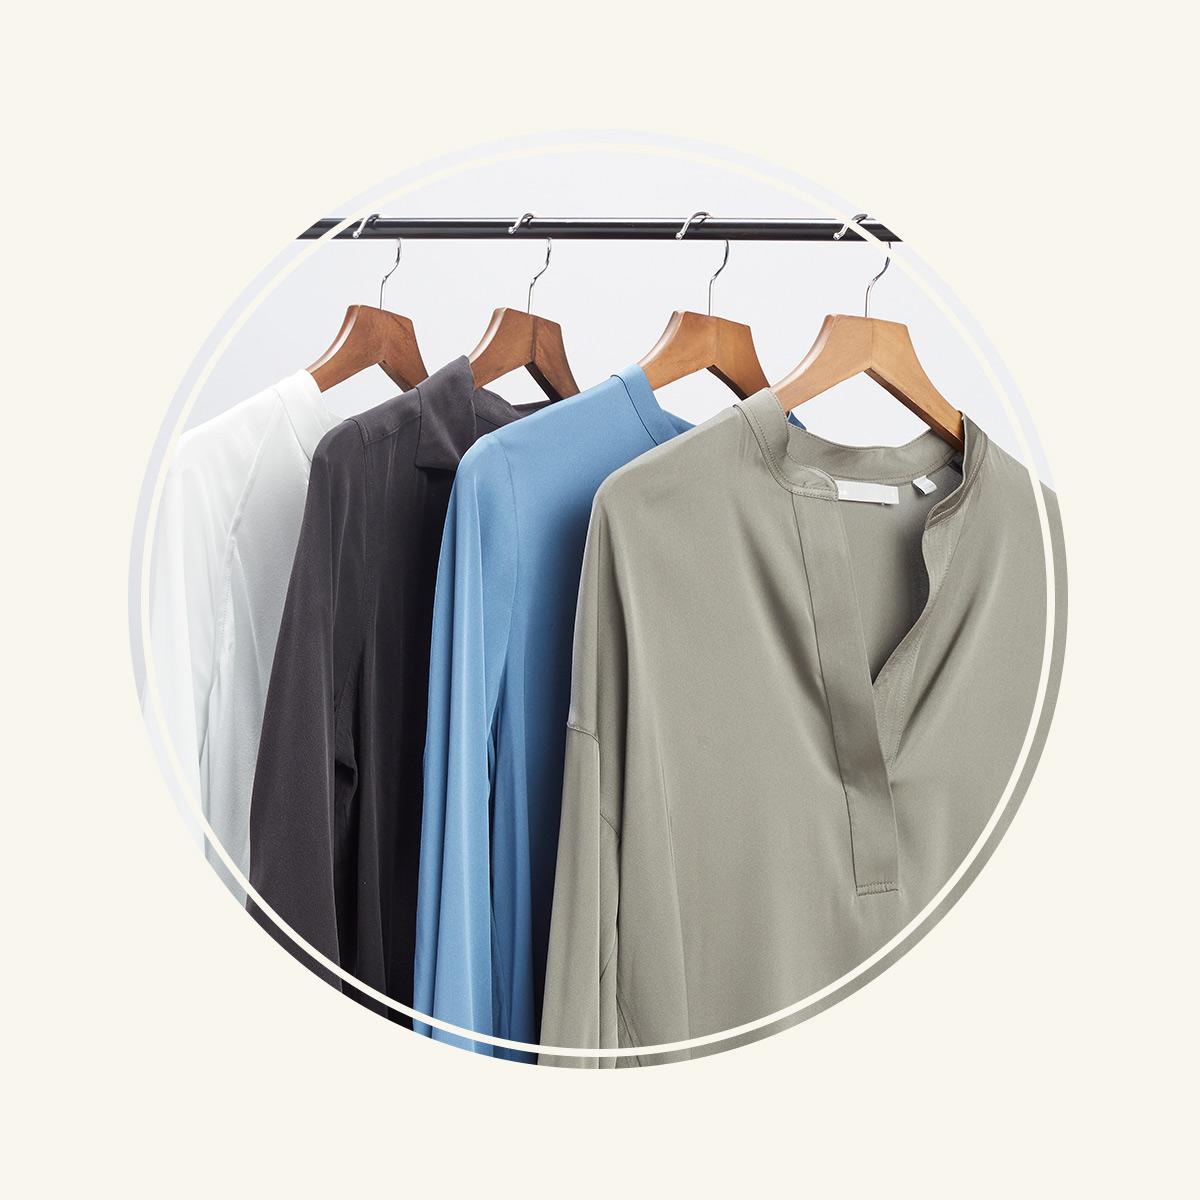 silk blouses on hangers